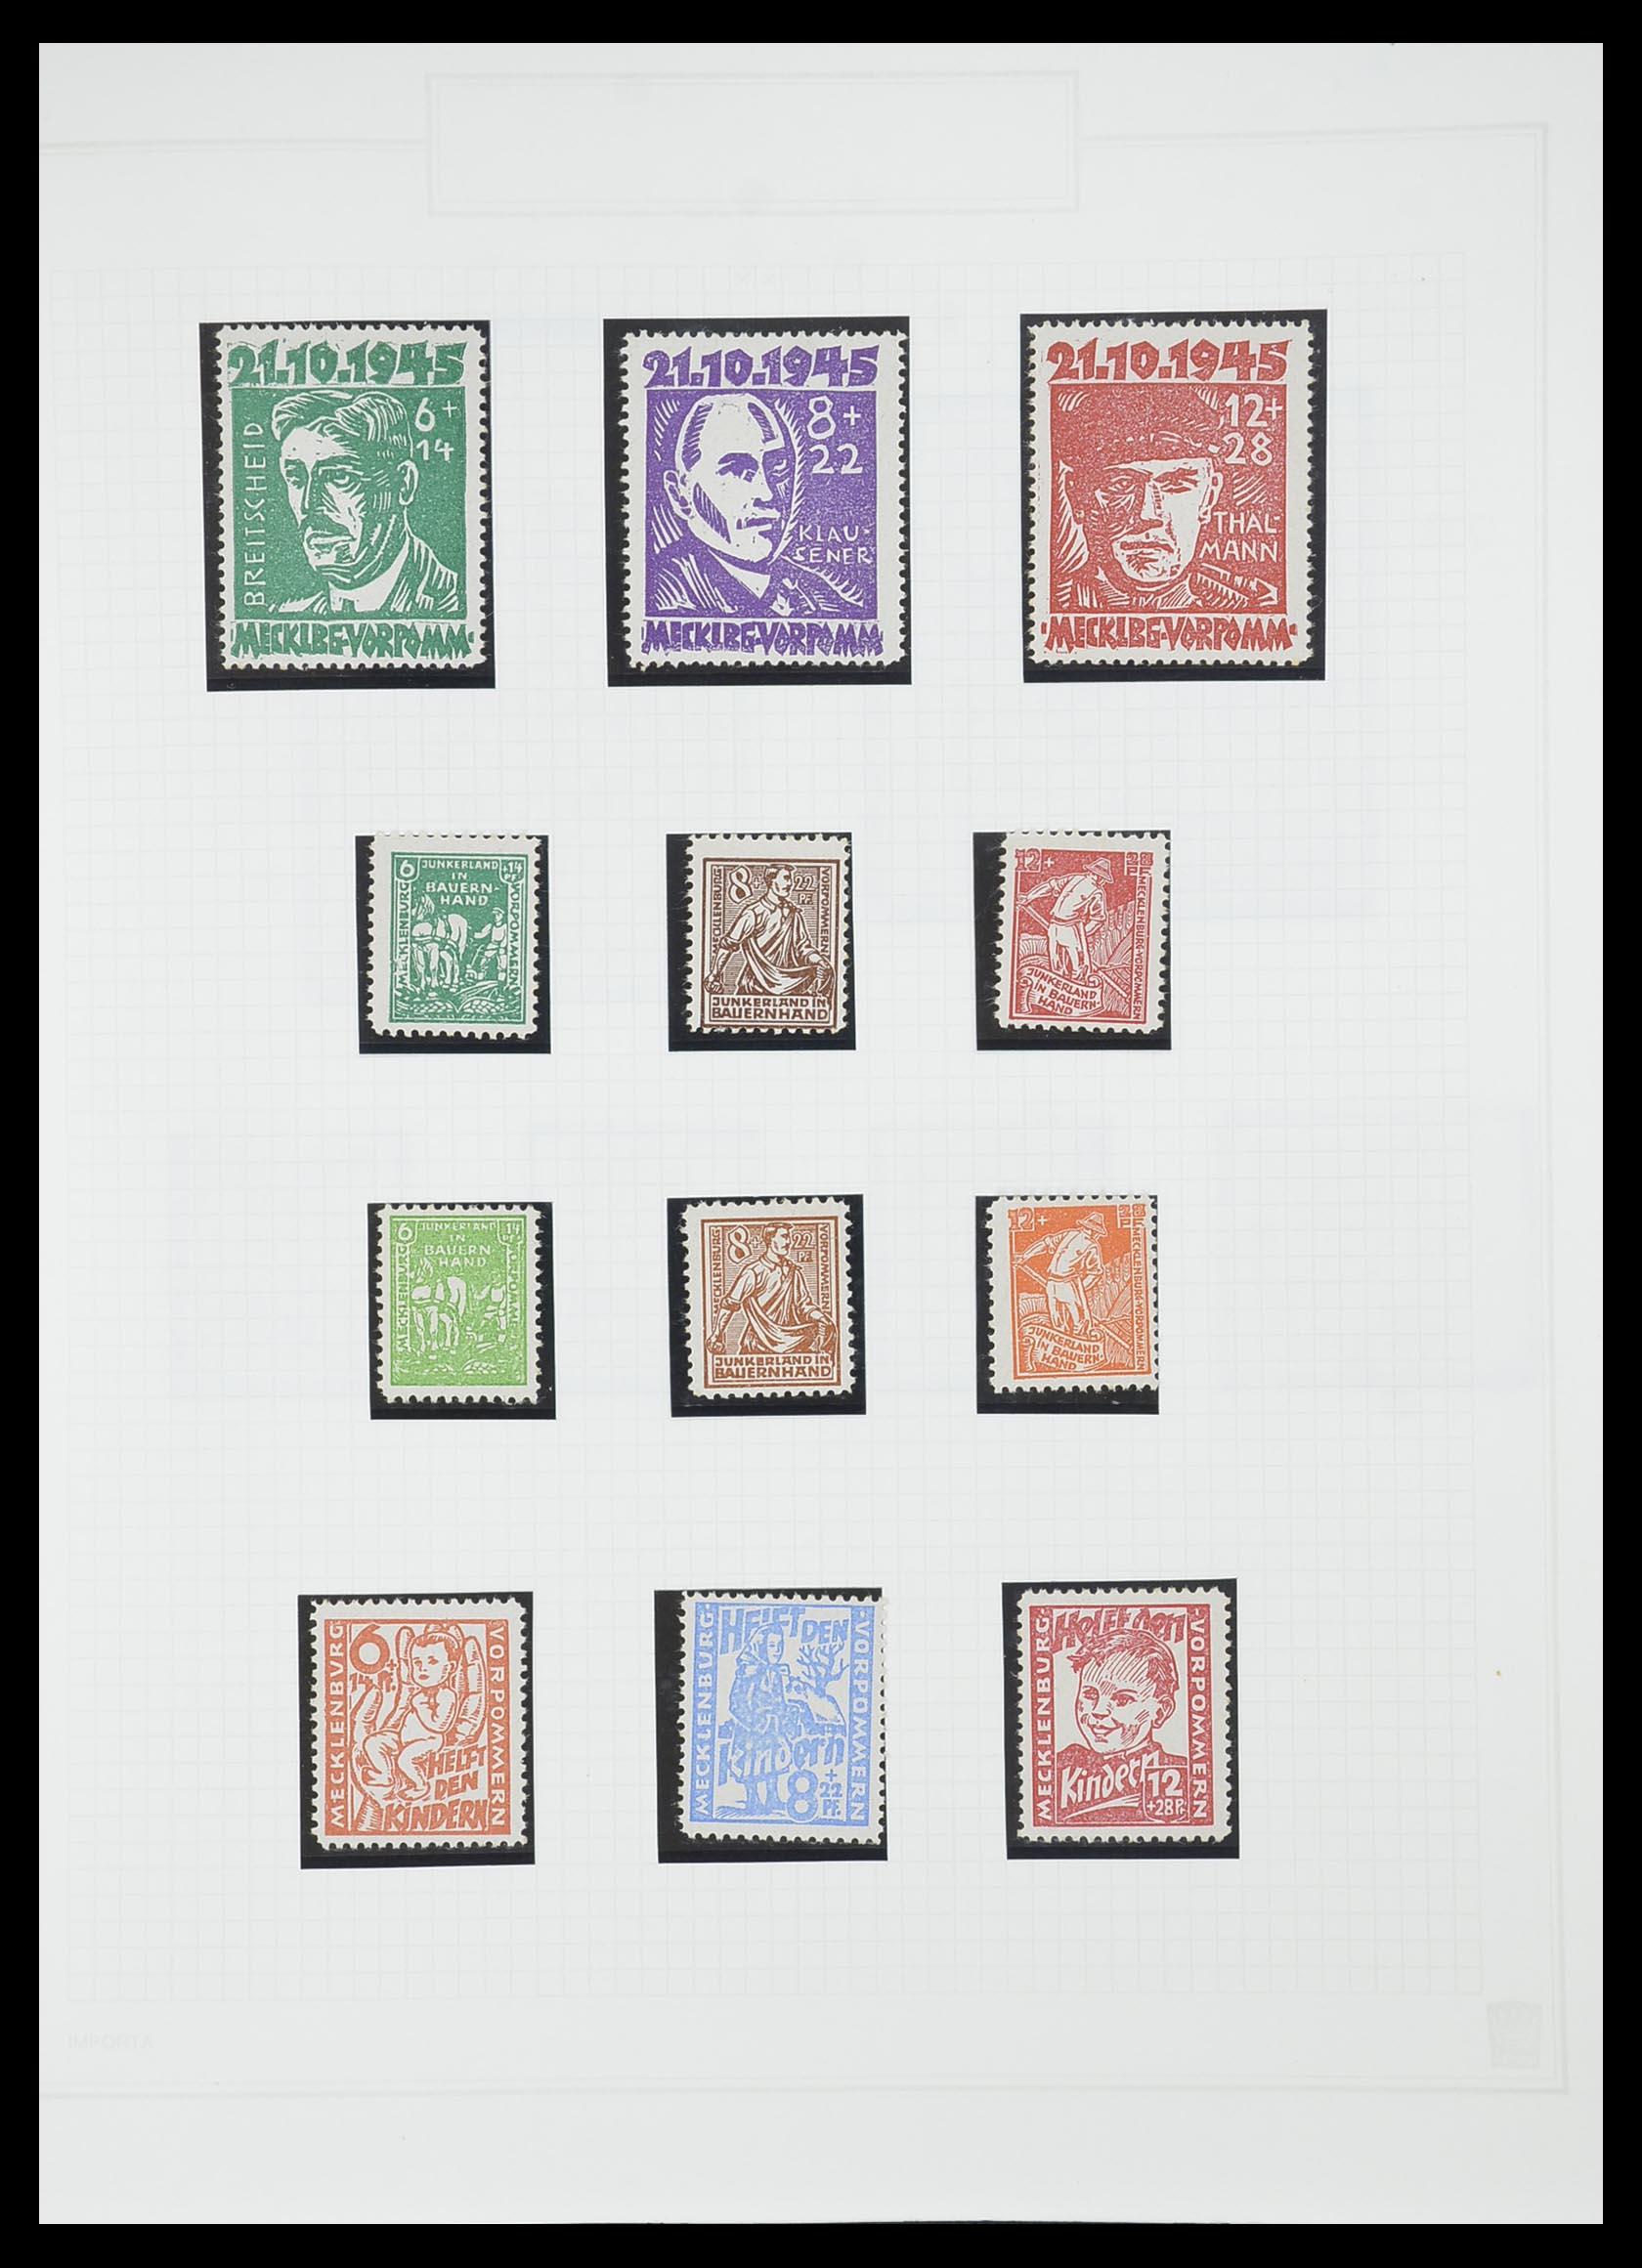 33698 013 - Postzegelverzameling 33698 Sovjet Zone 1945-1948.